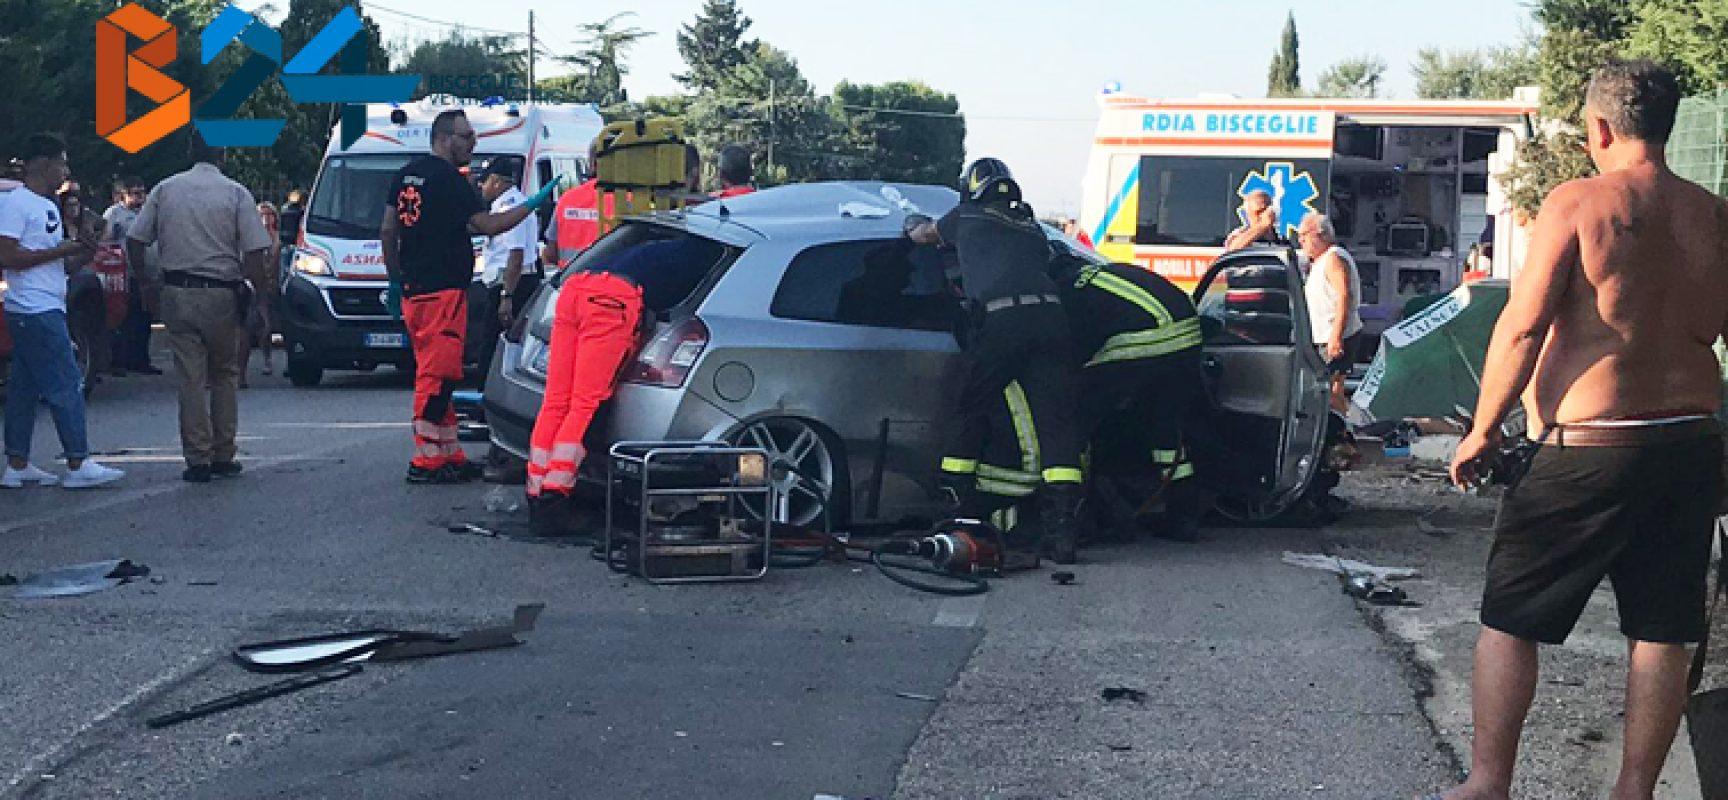 Violento incidente sulla Sp85, quattro feriti